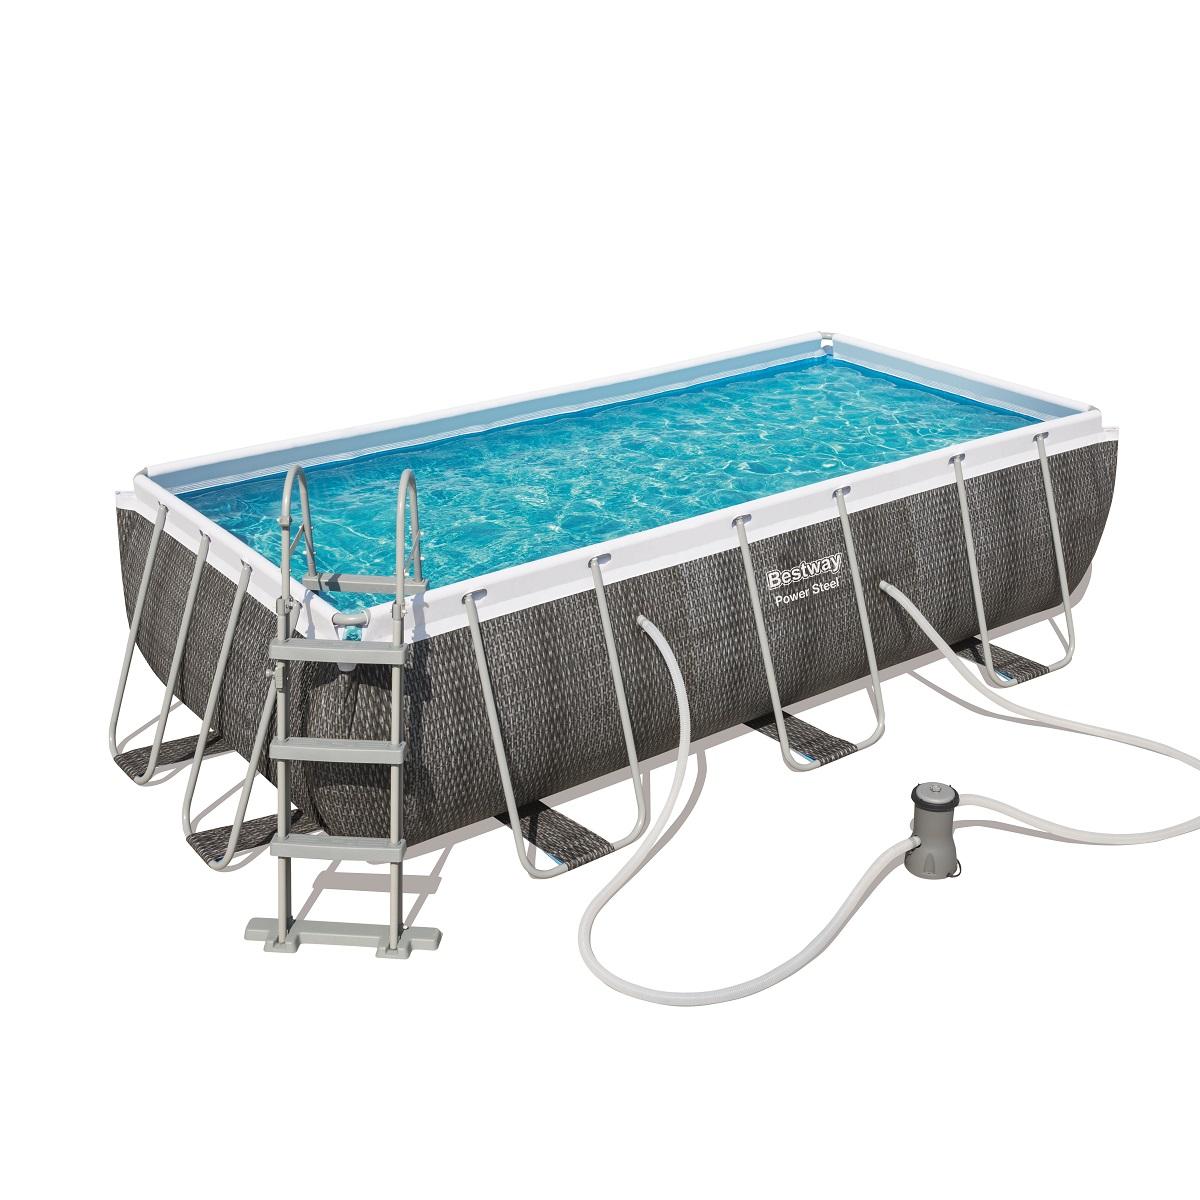 Bazén BESTWAY Power Steel Pool 404 x 201 x 100 cm set s kartušovou filtrací